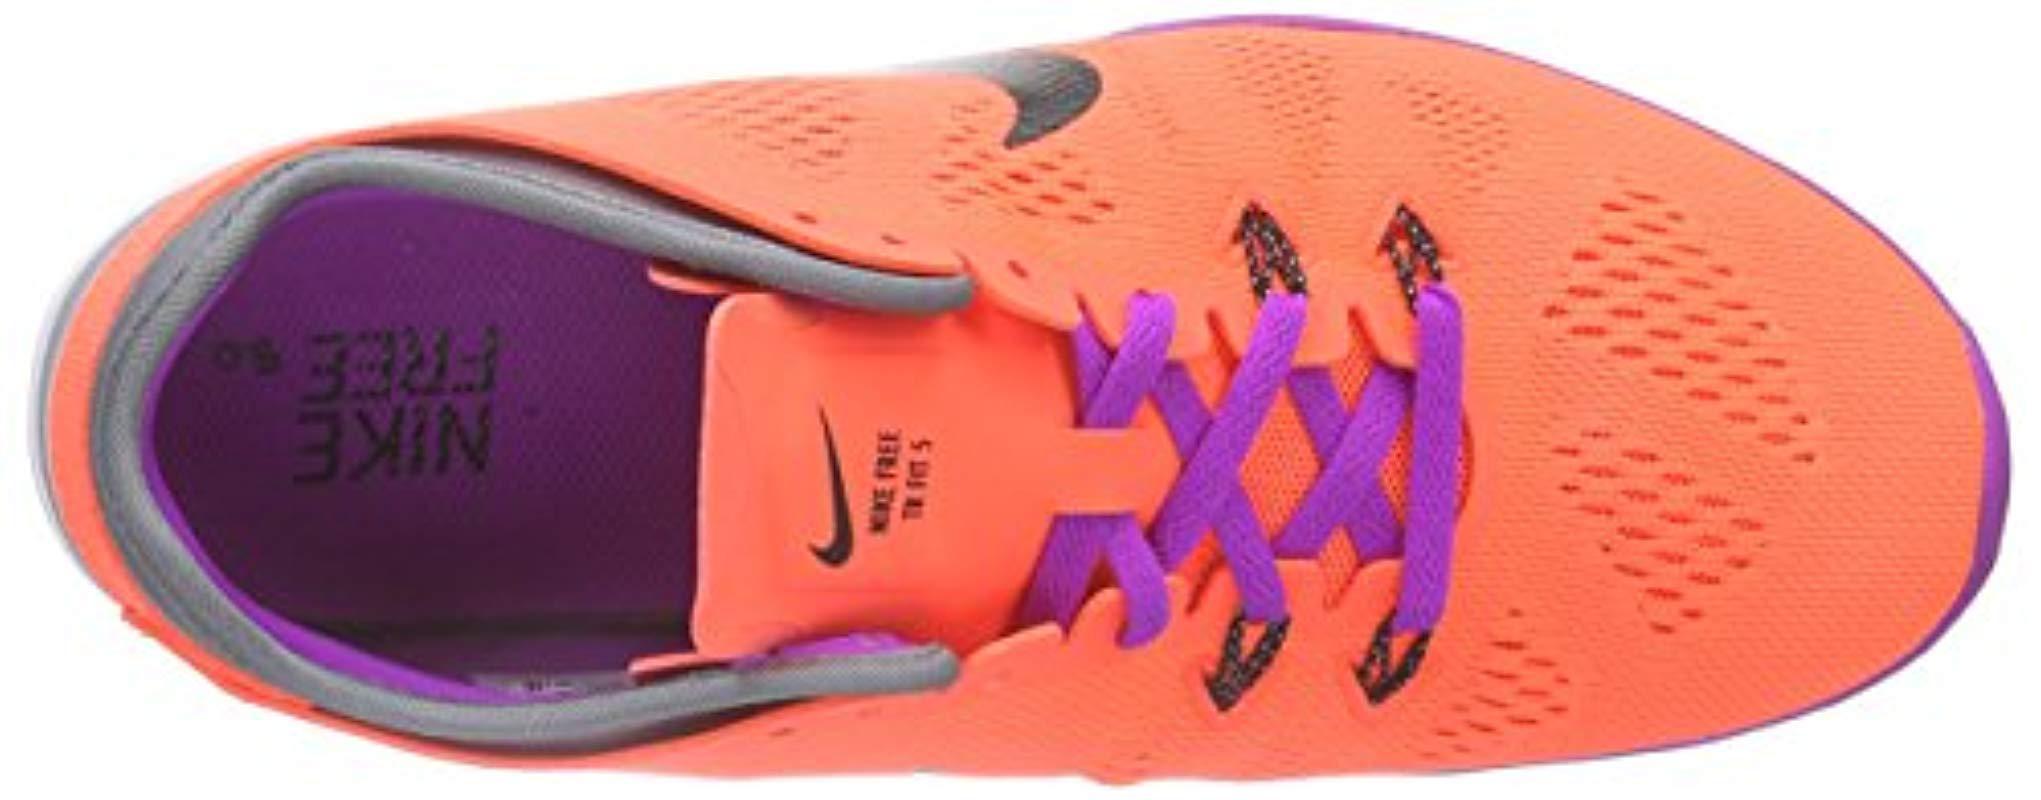 65fa63a90e1 nike-Multicolor-RedBlack-Free-Tr-50-Fit-5-Multisport-Indoor-Shoes.jpeg